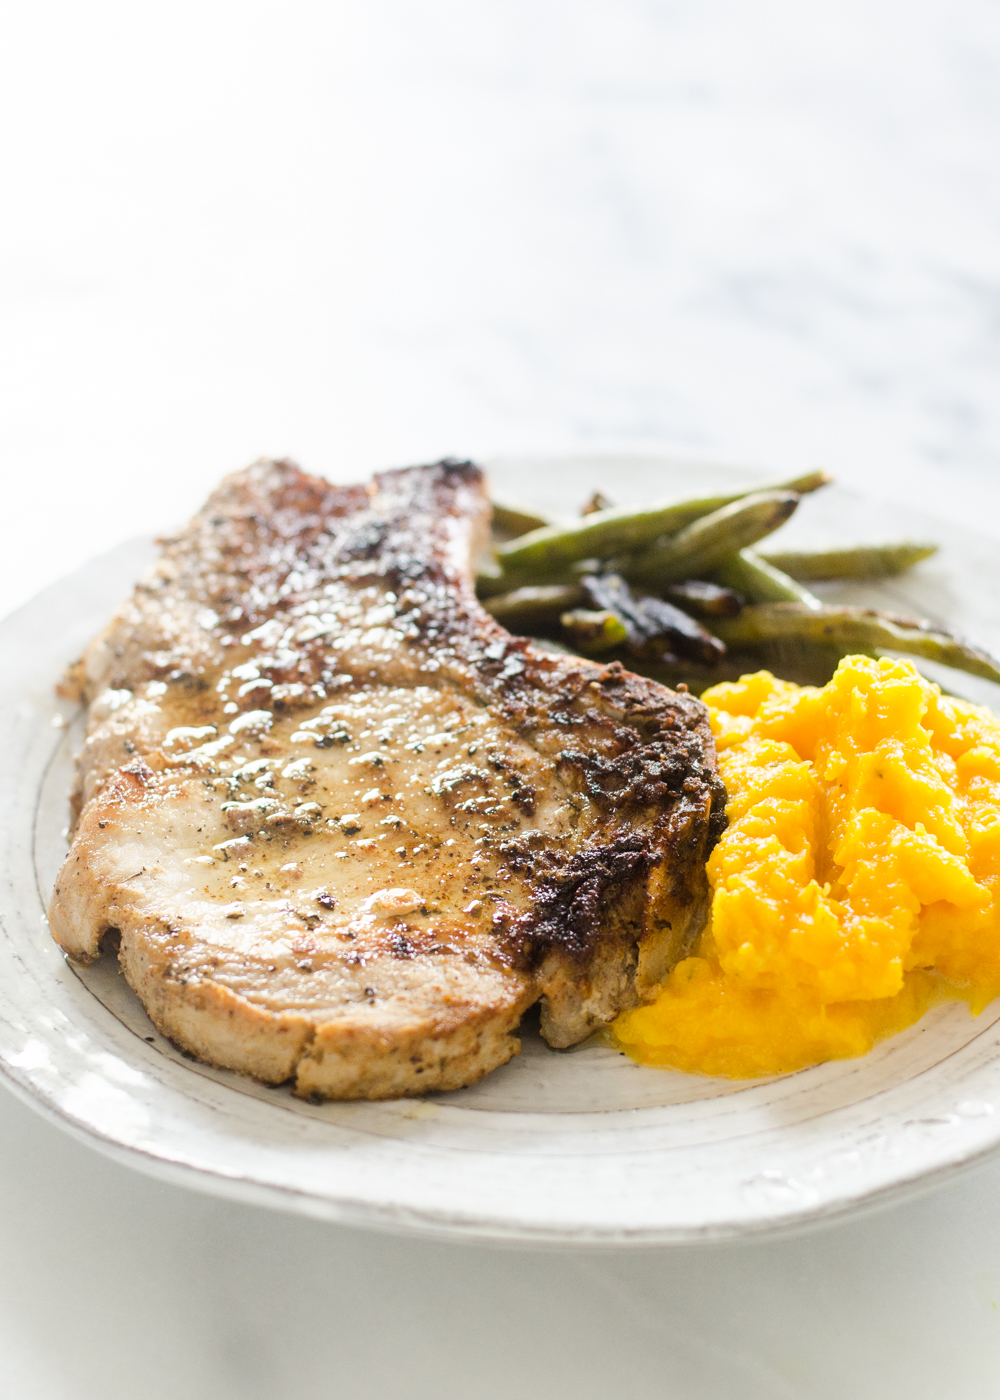 Butcher Box Review Meal 4 - Porkchops + Mashed Butternut Squash + Garlic Green Beans 2